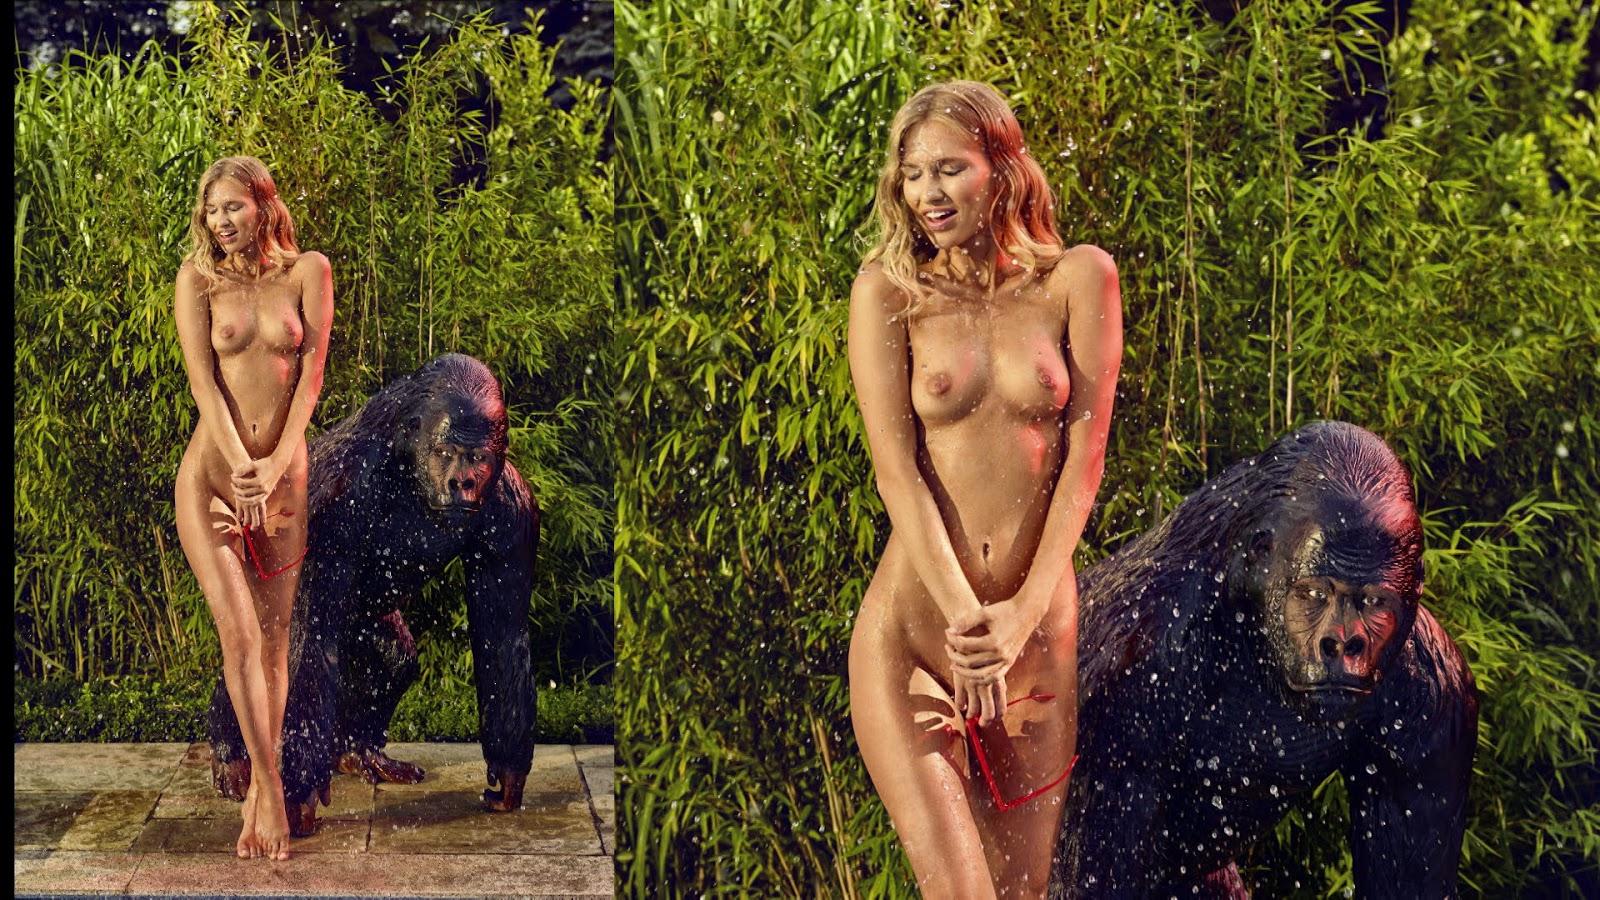 nude photo shoots at pool